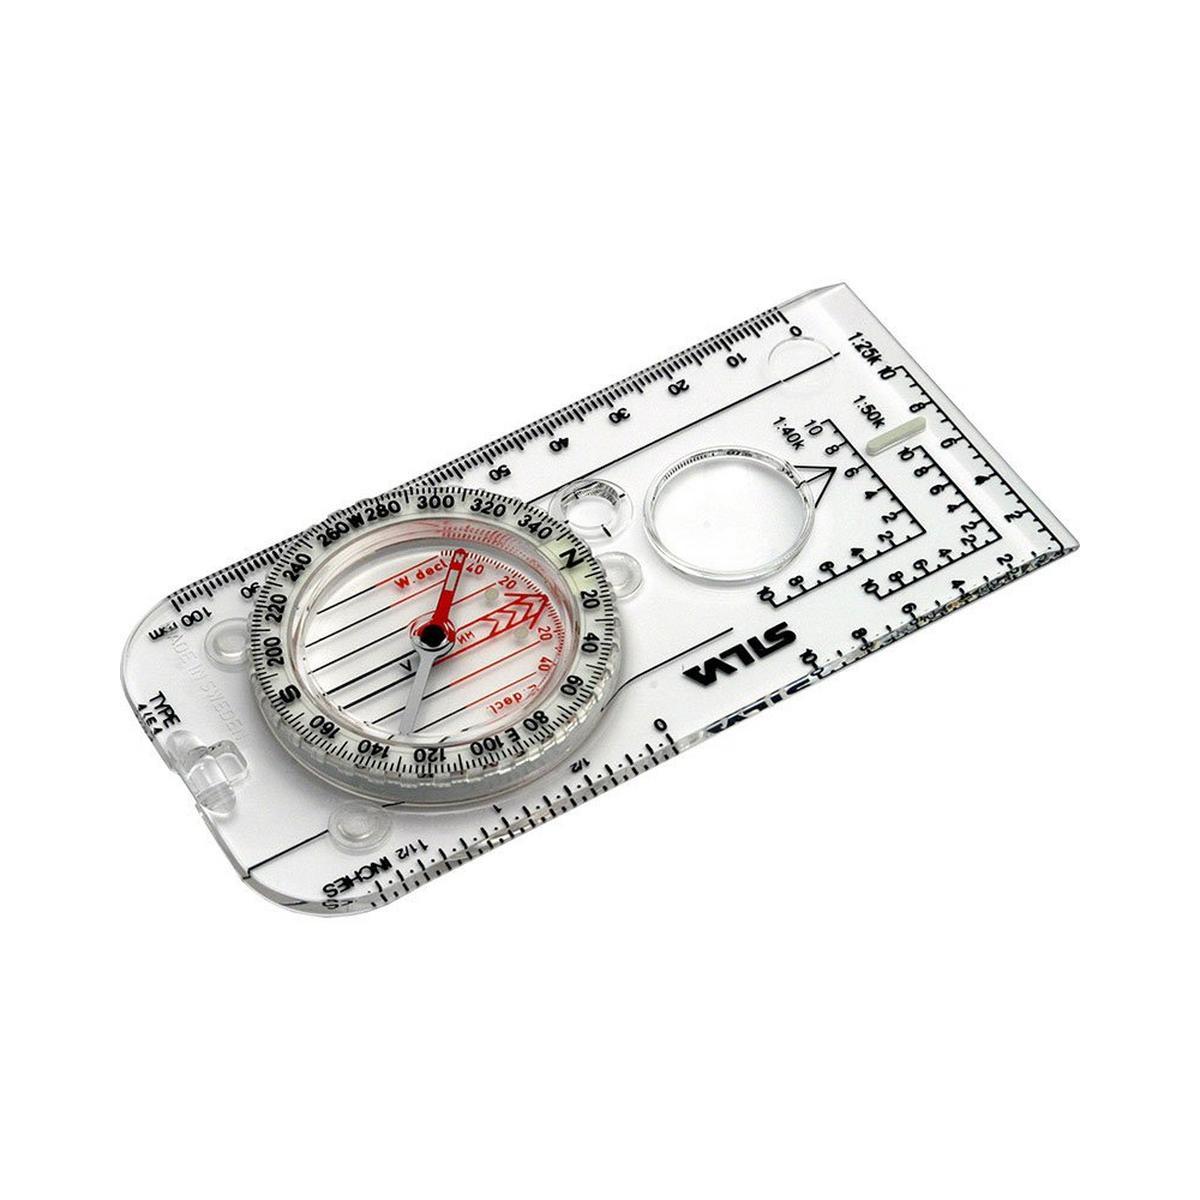 Silva Compass Expedition 4